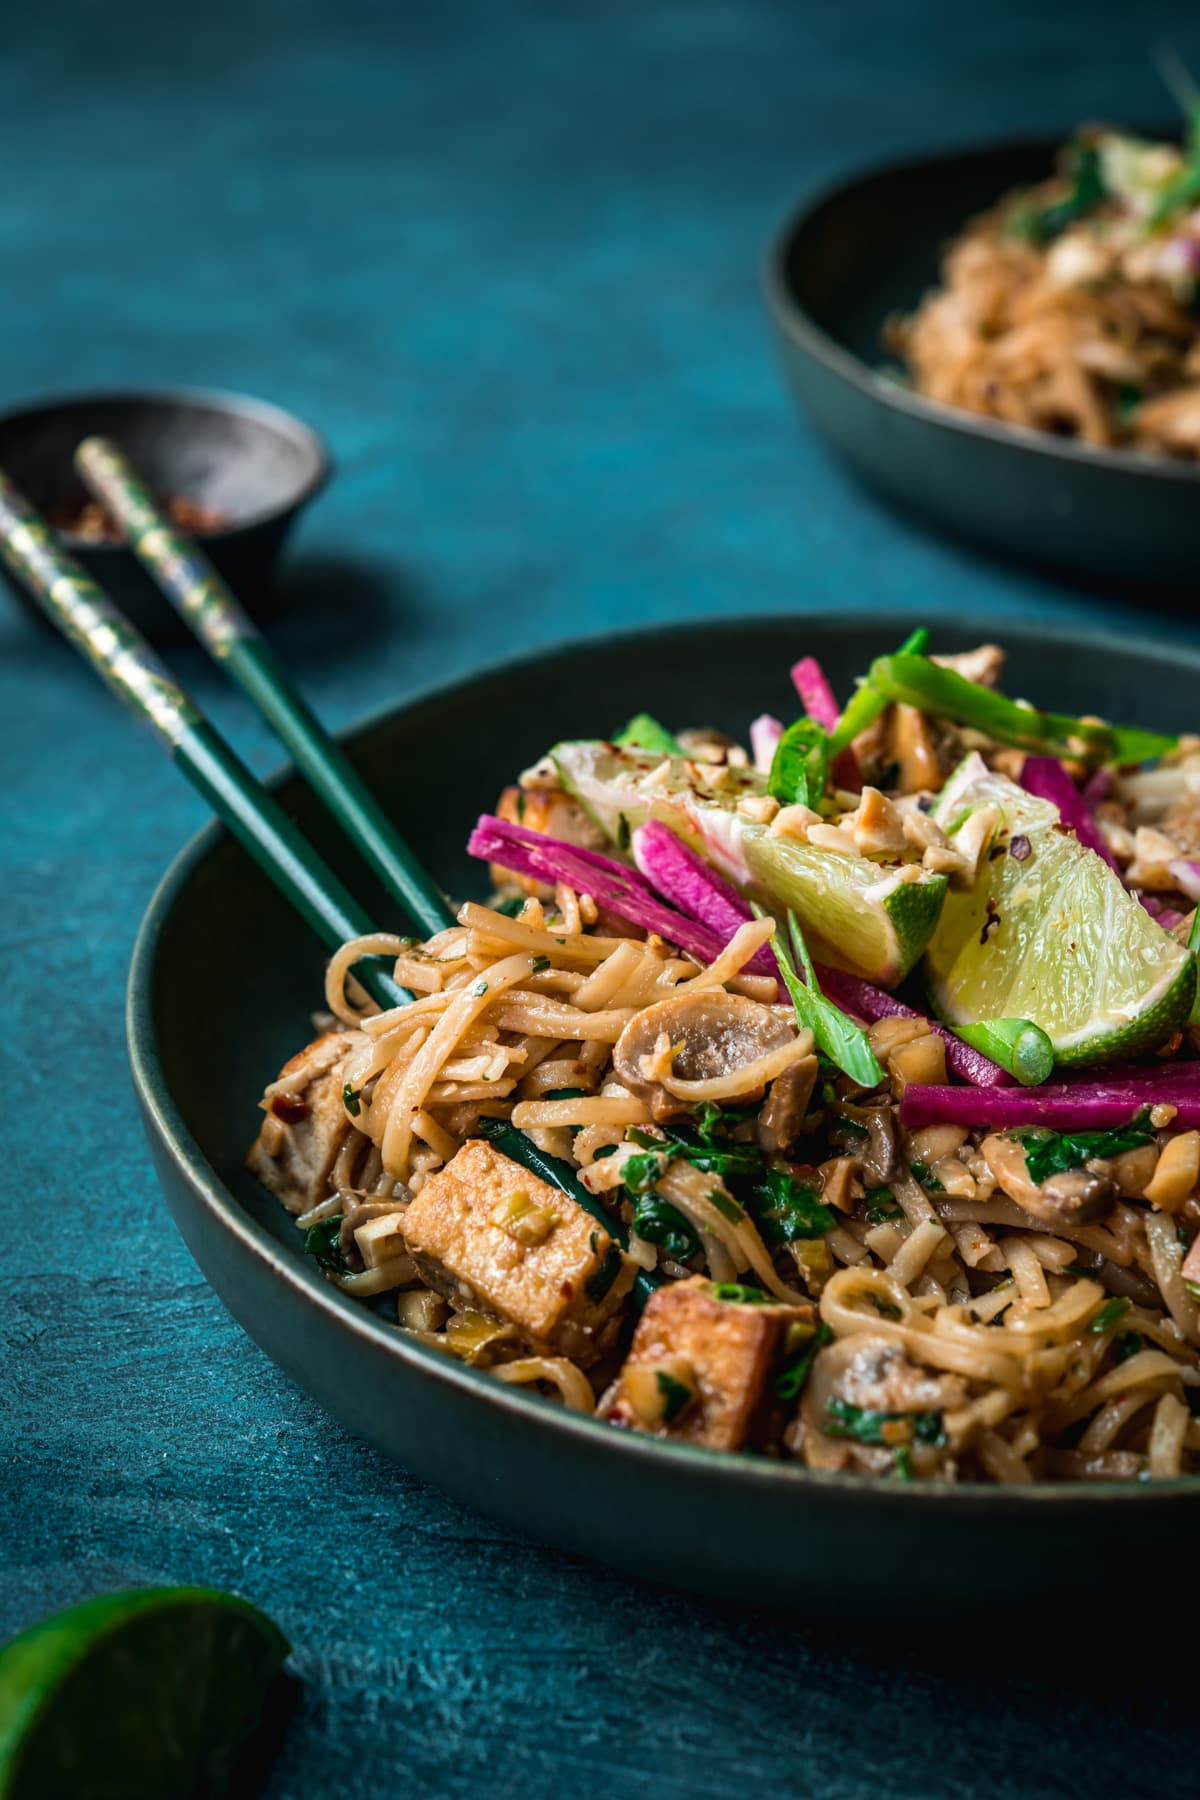 close up view of vegan pad thai with rice noodles, tofu and mushrooms.